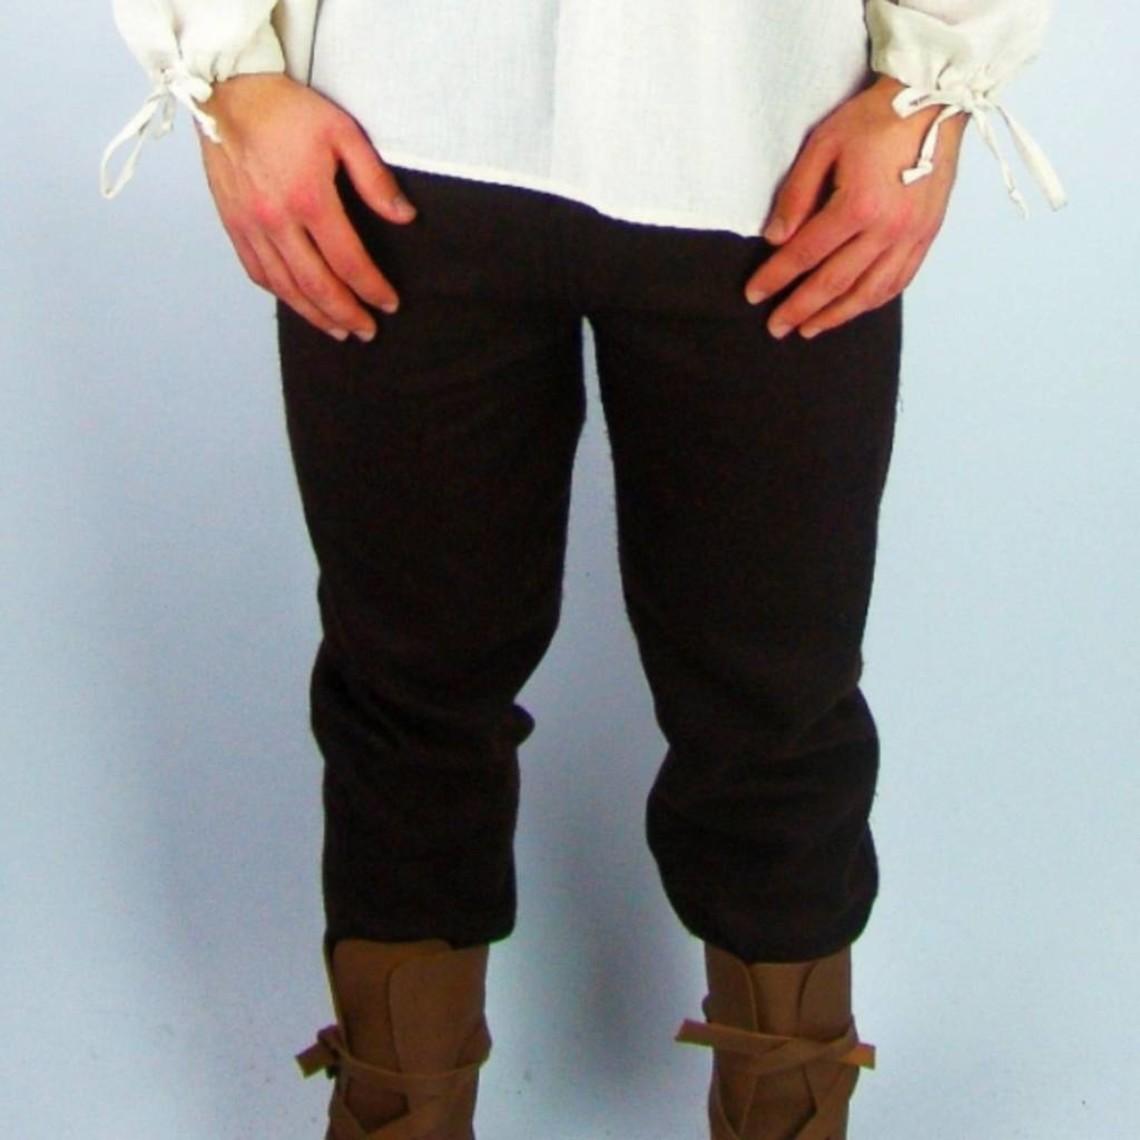 Leonardo Carbone Woolen trousers, black